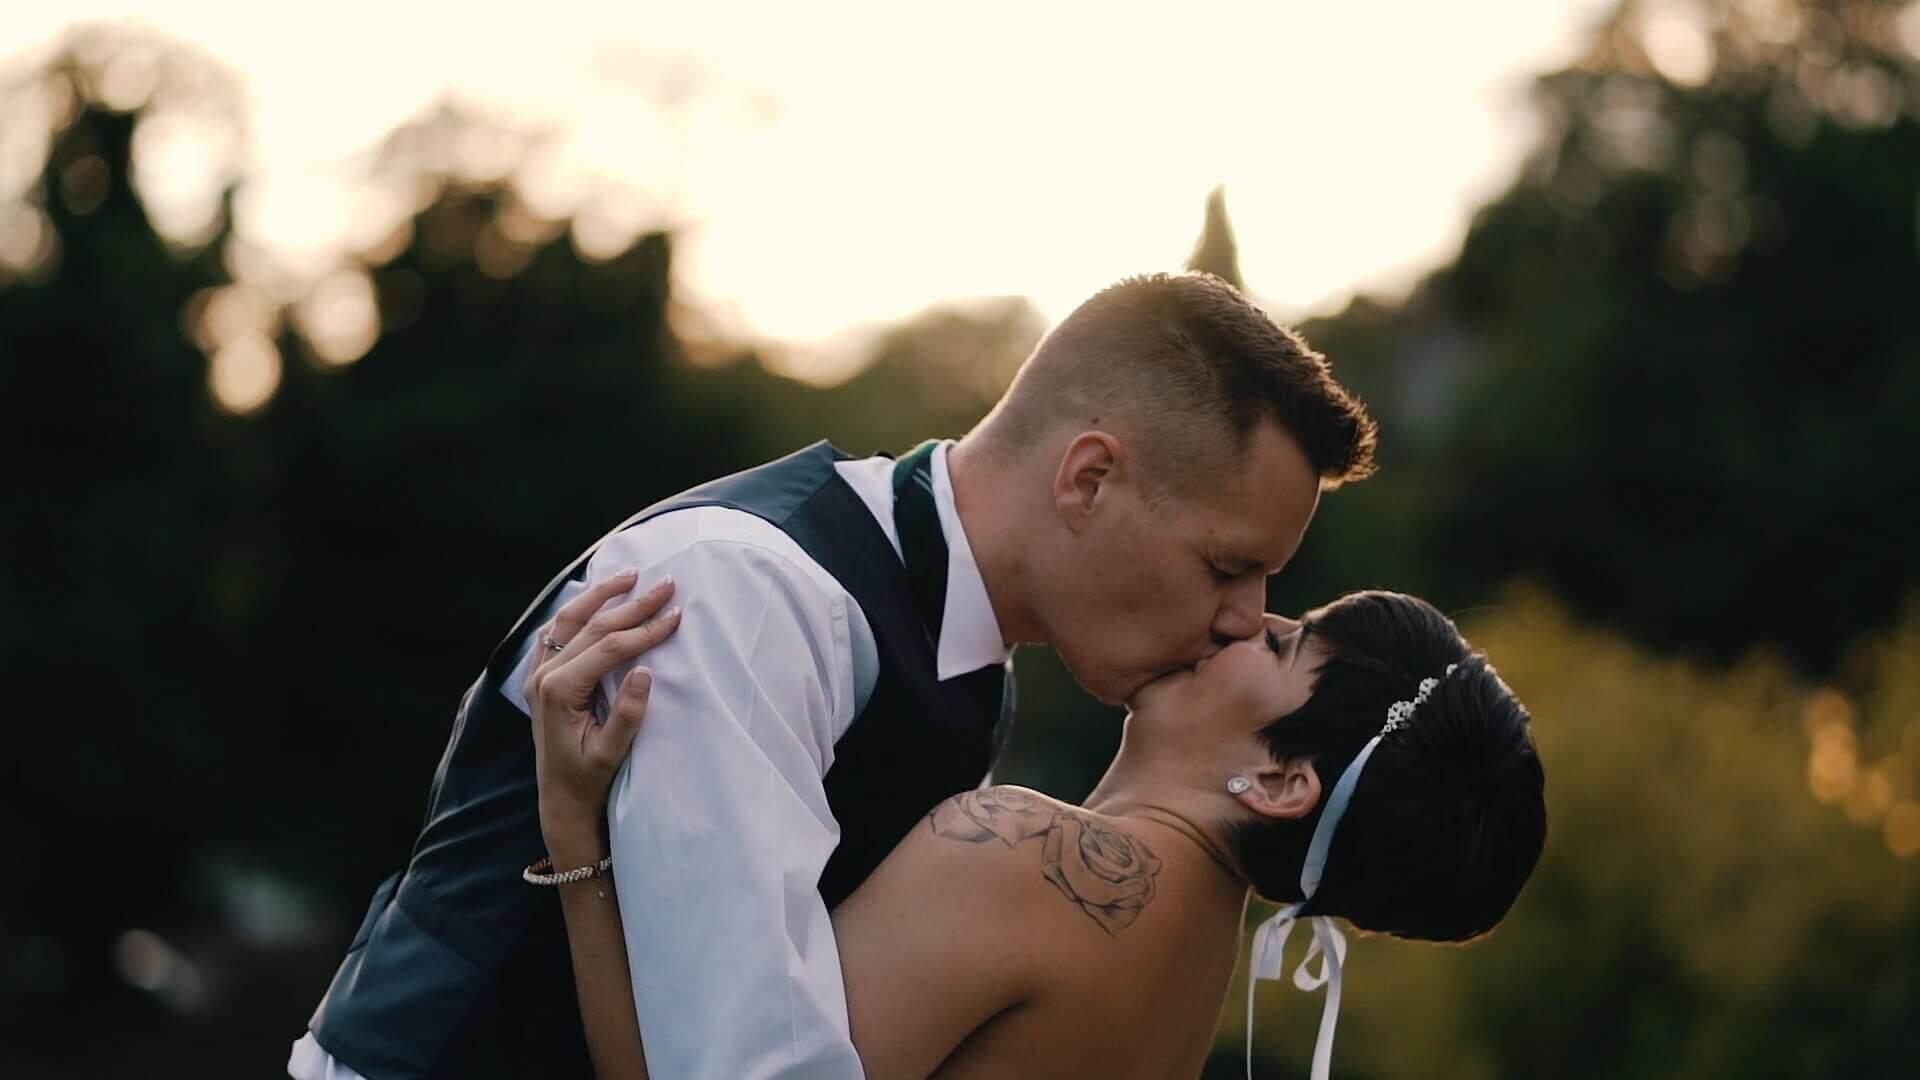 unique-wedding-video-in-the-west-mill-derby-de22-1dz